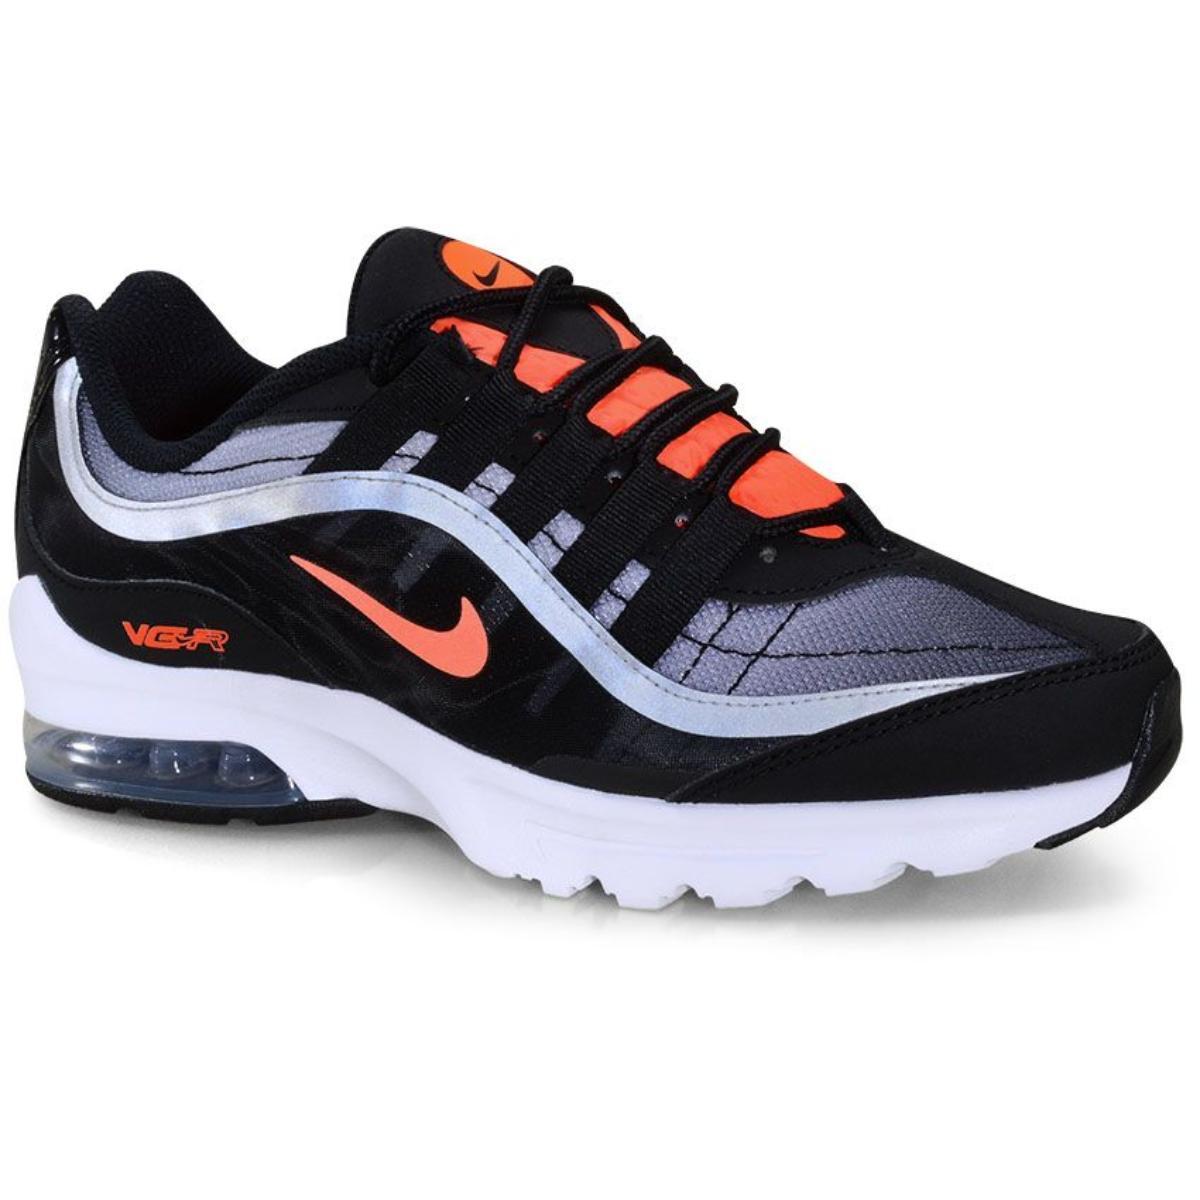 Tênis Feminino Nike Ct1730-003 Air Max Vg-r Preto/laranja Neon